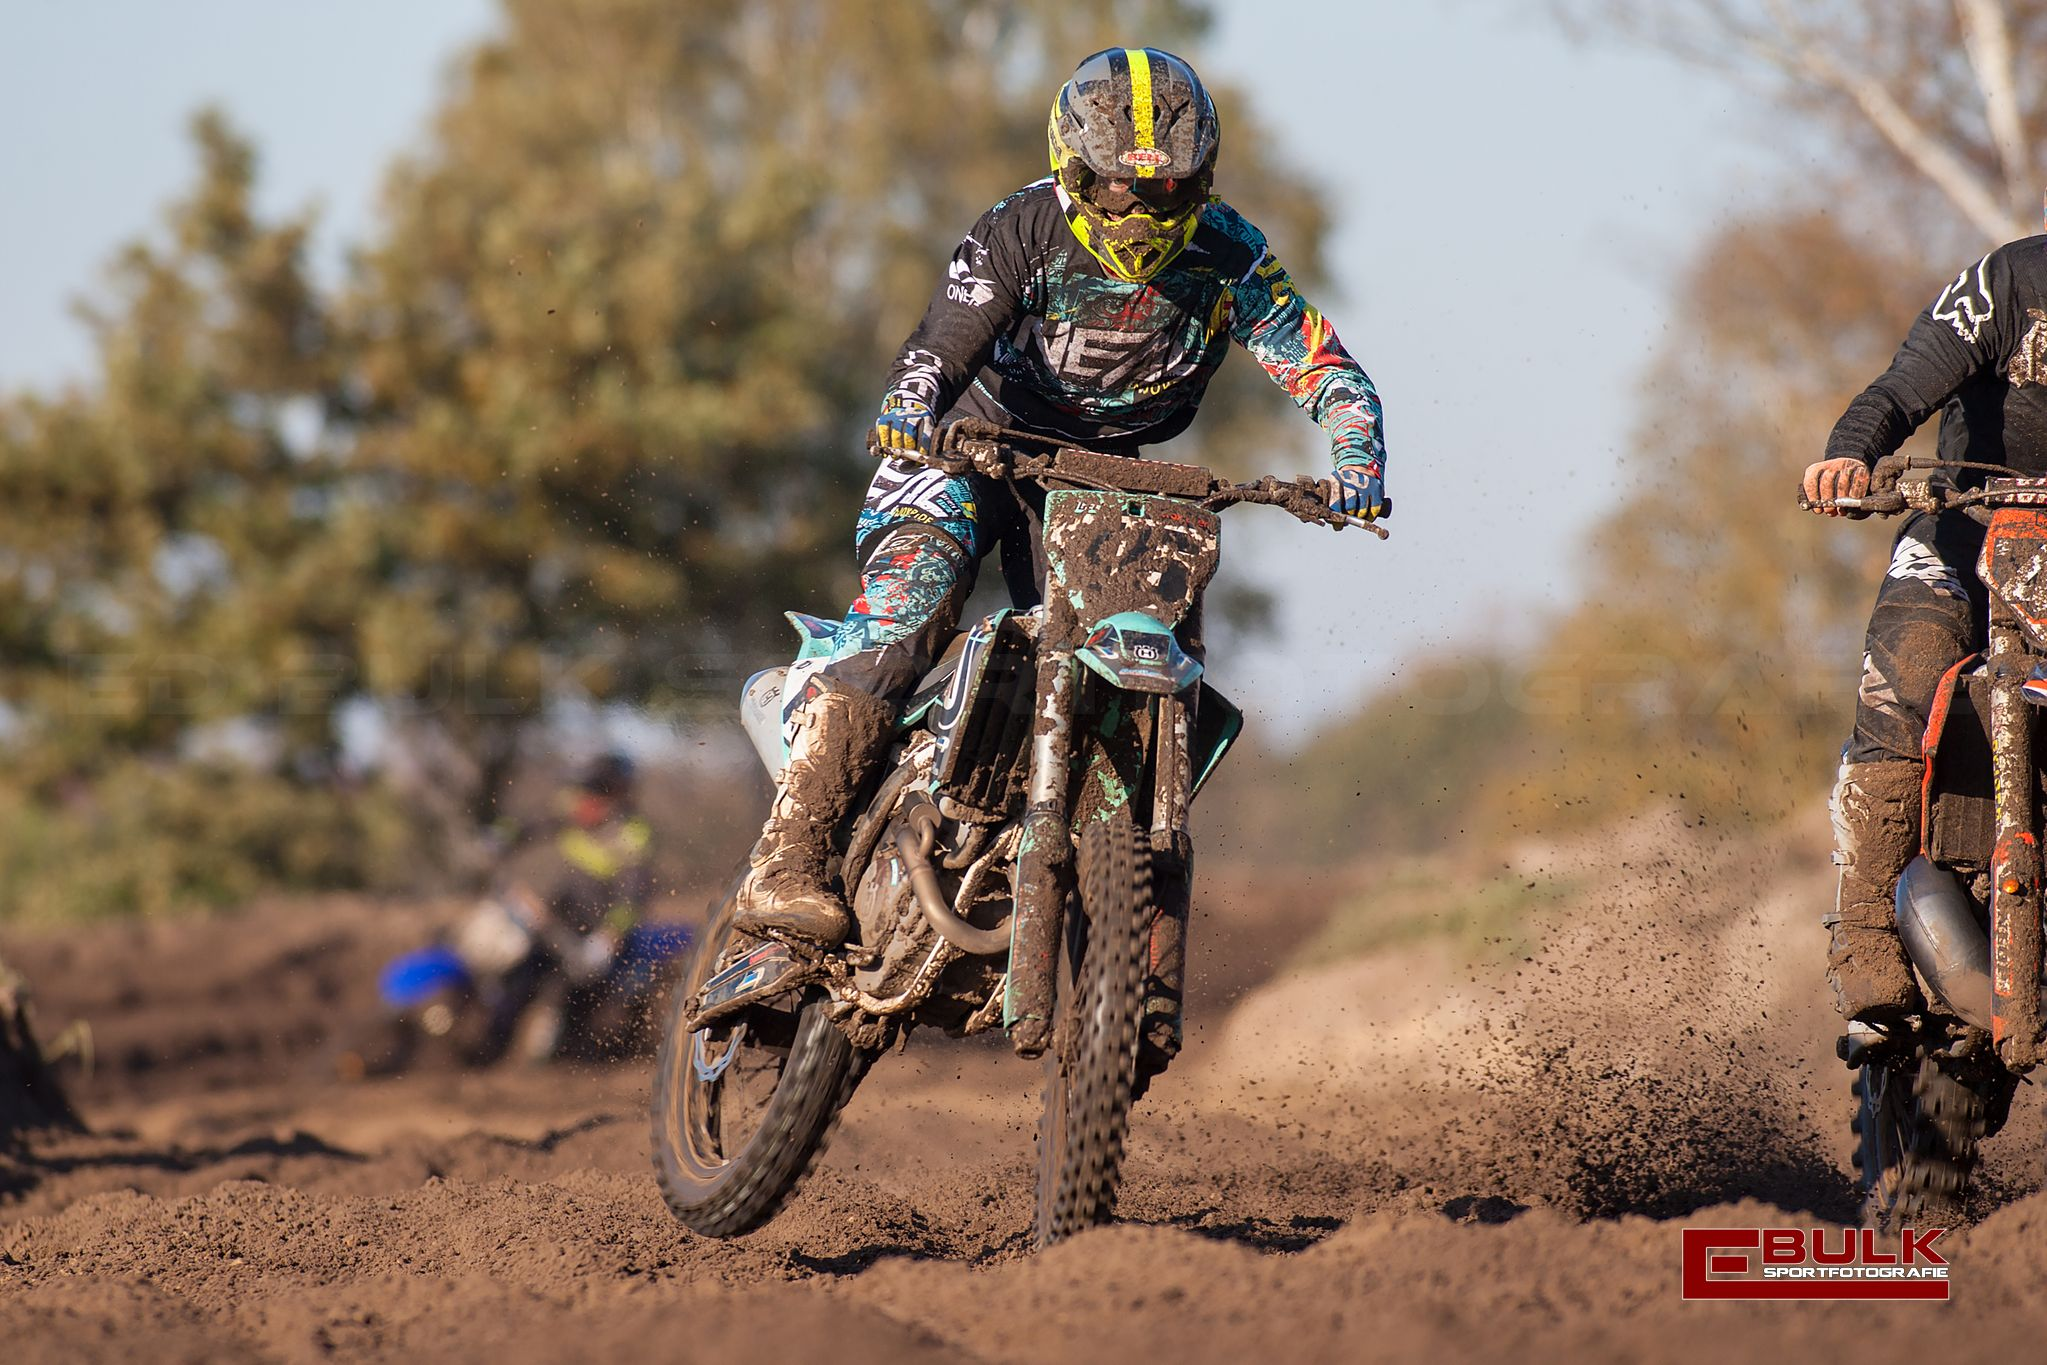 ebs_1095-ed_bulk_sportfotografie